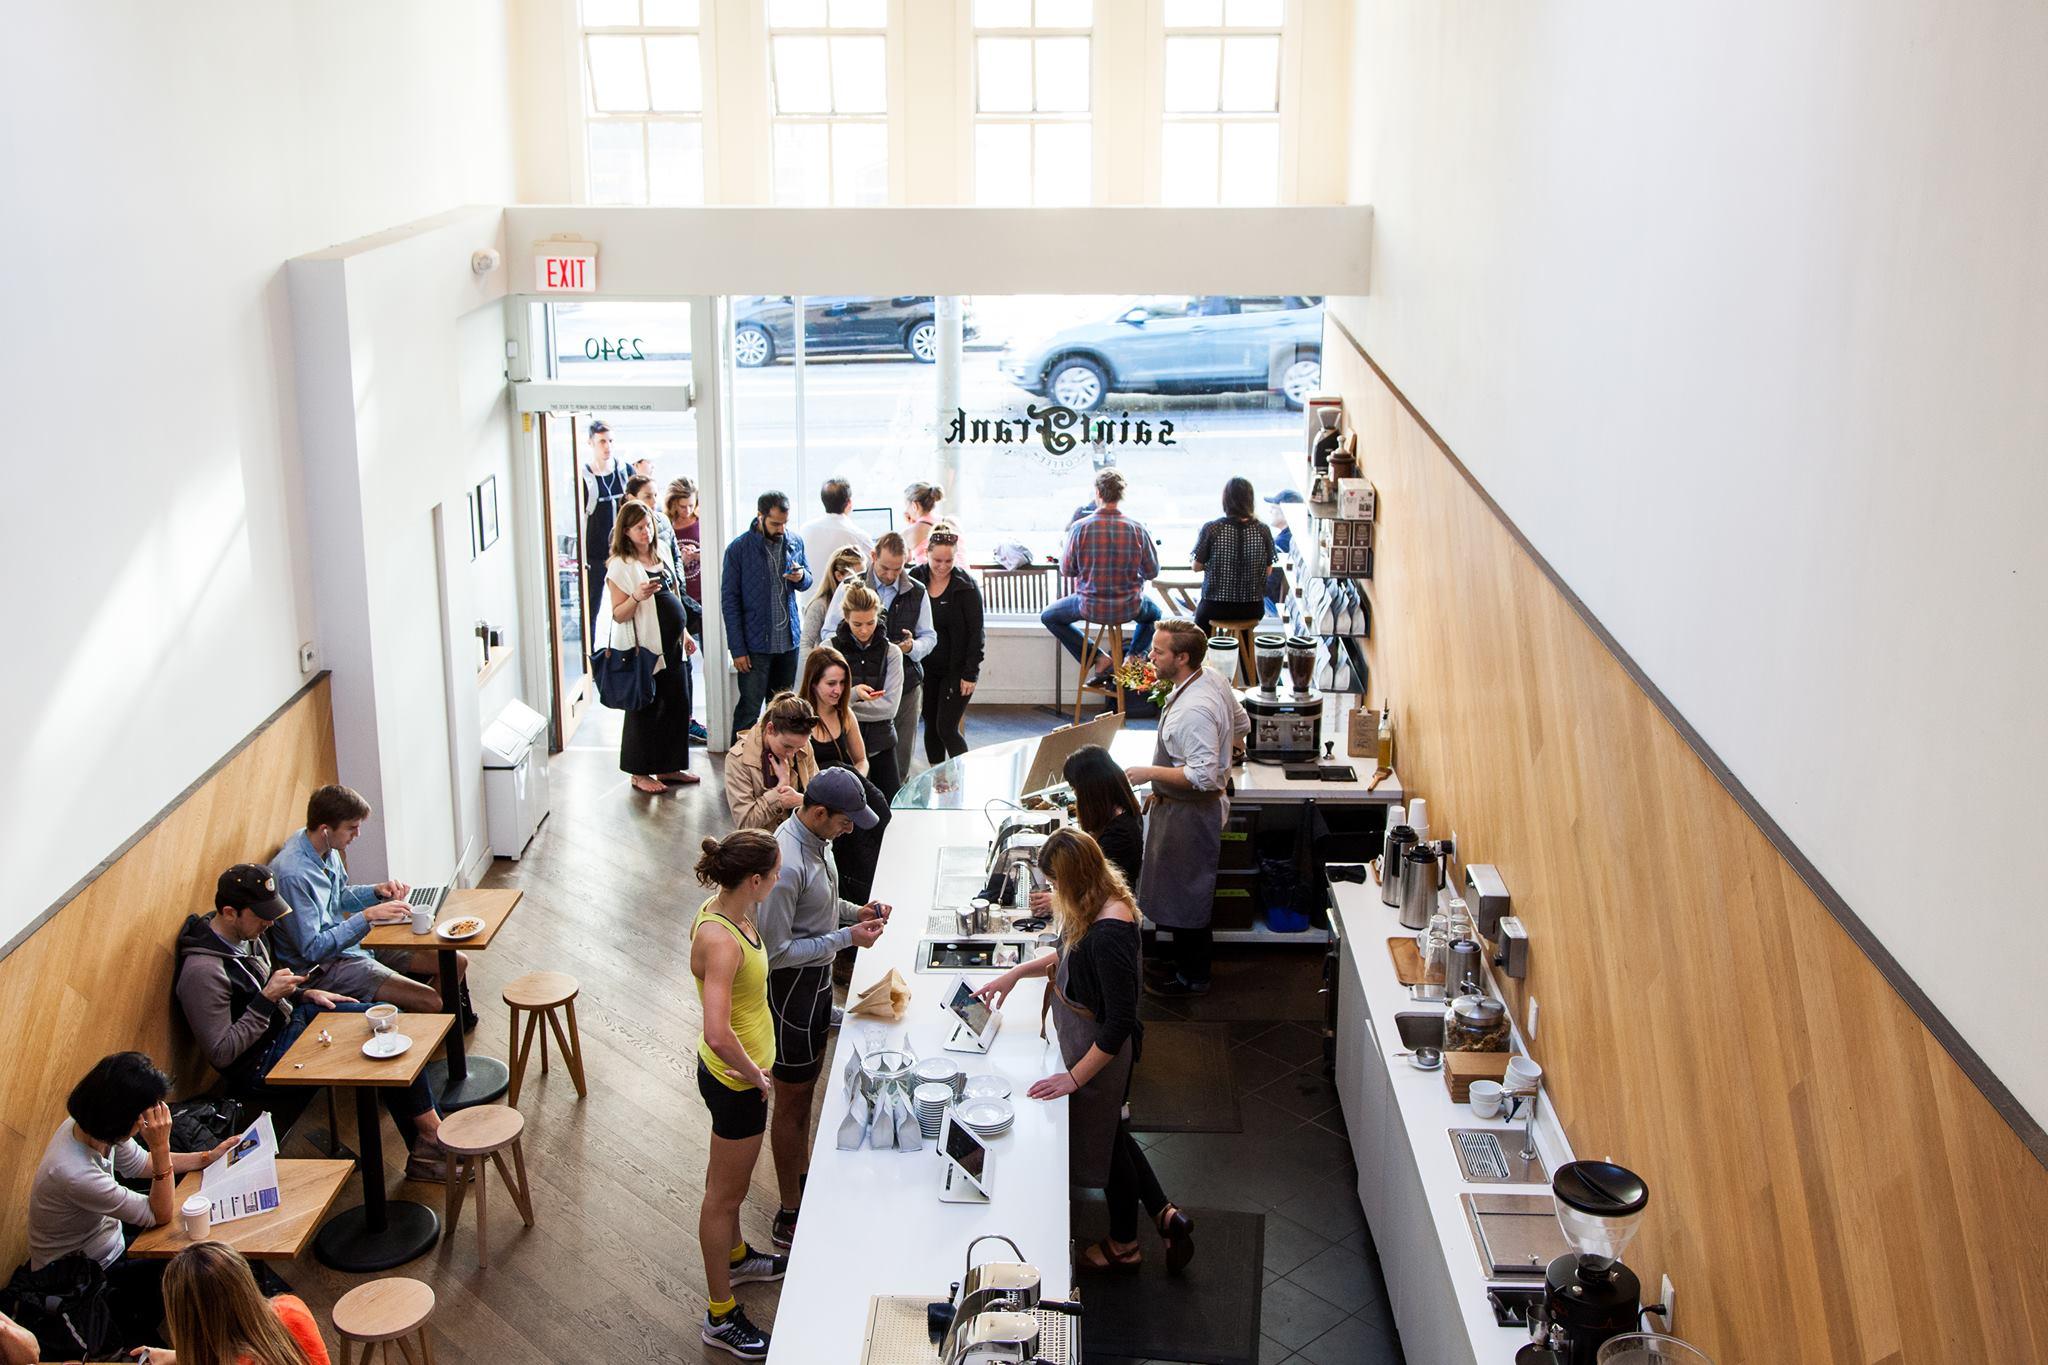 St Frank's Coffee – San Francisco, California